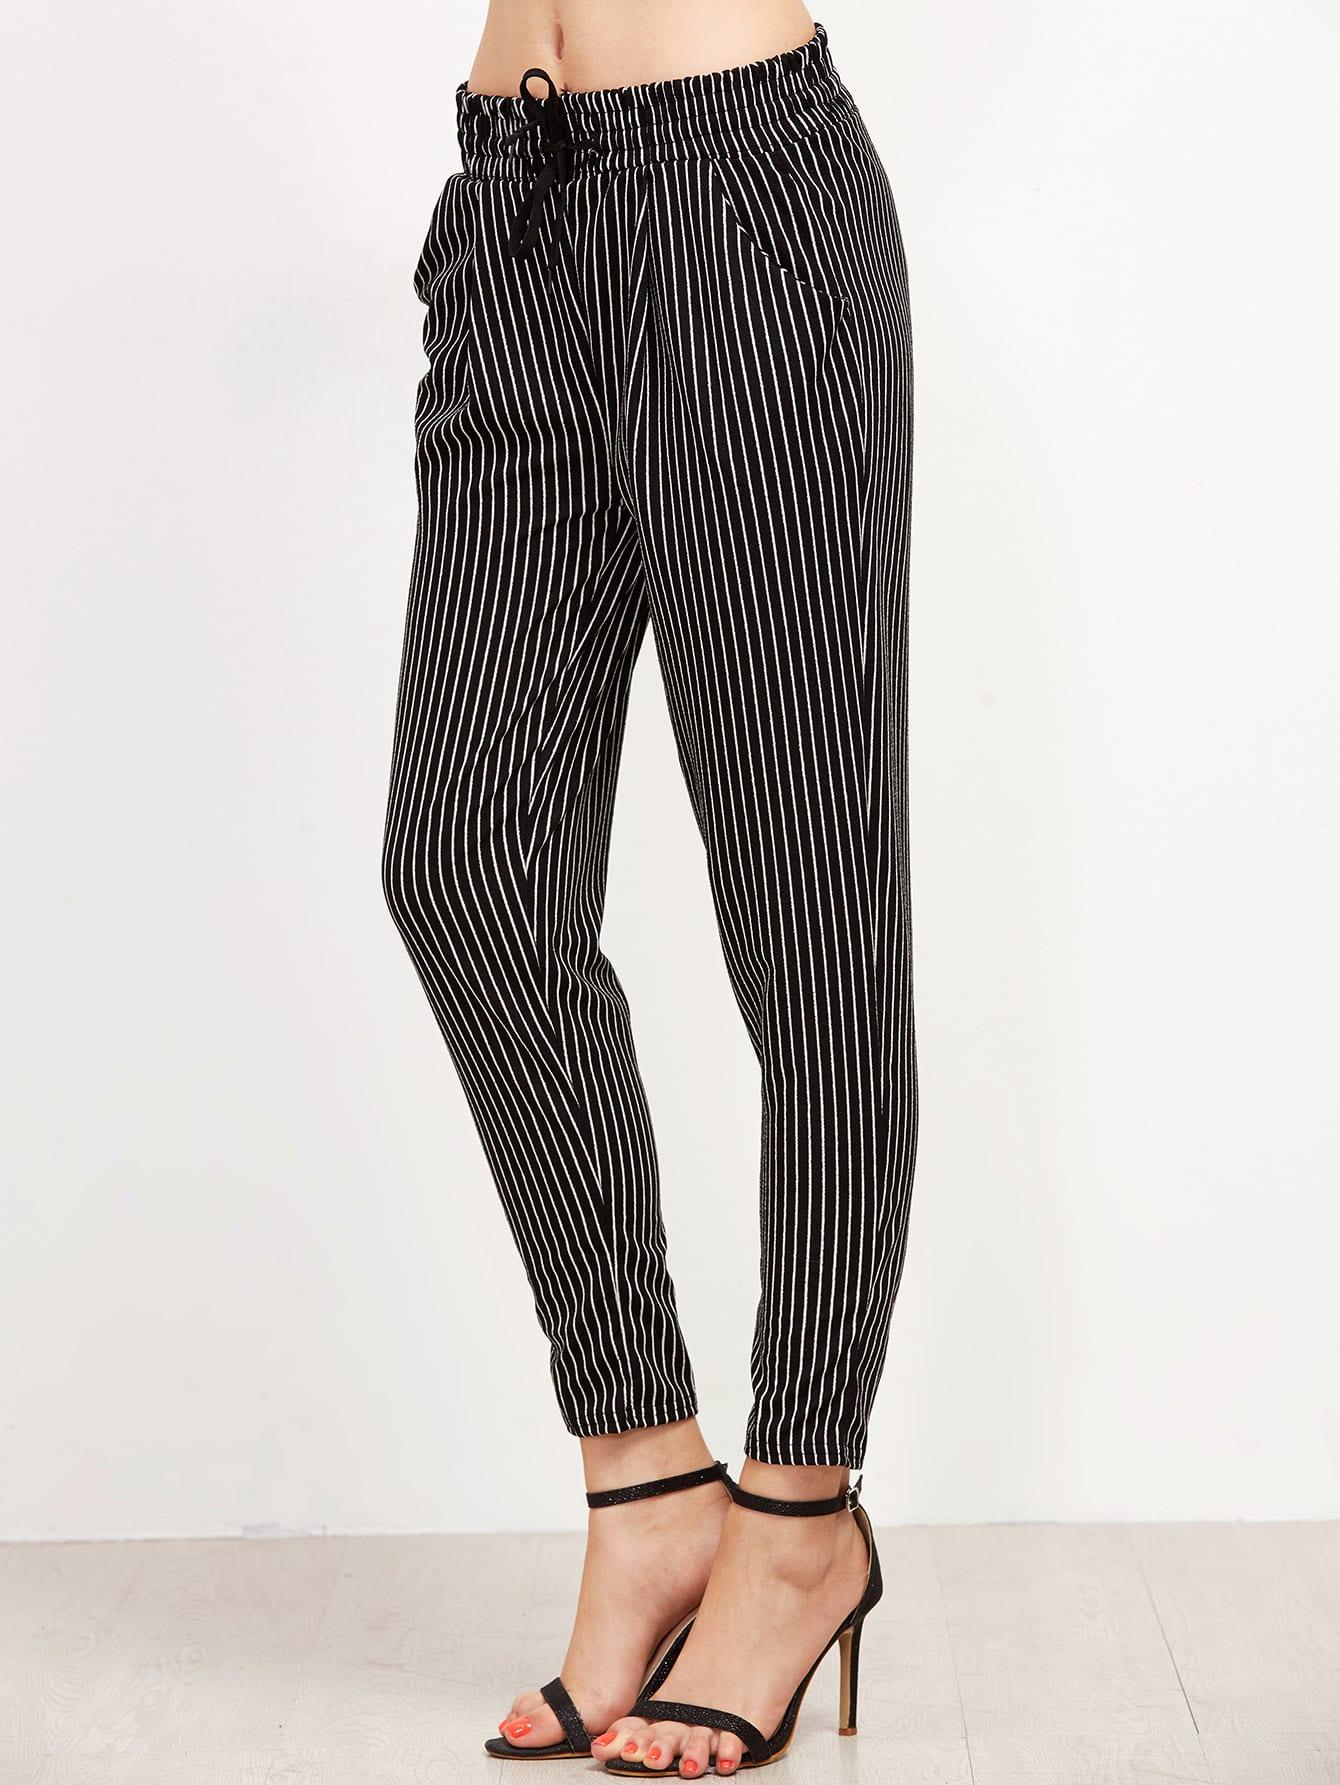 Black Vertical Striped Drawstring Pants